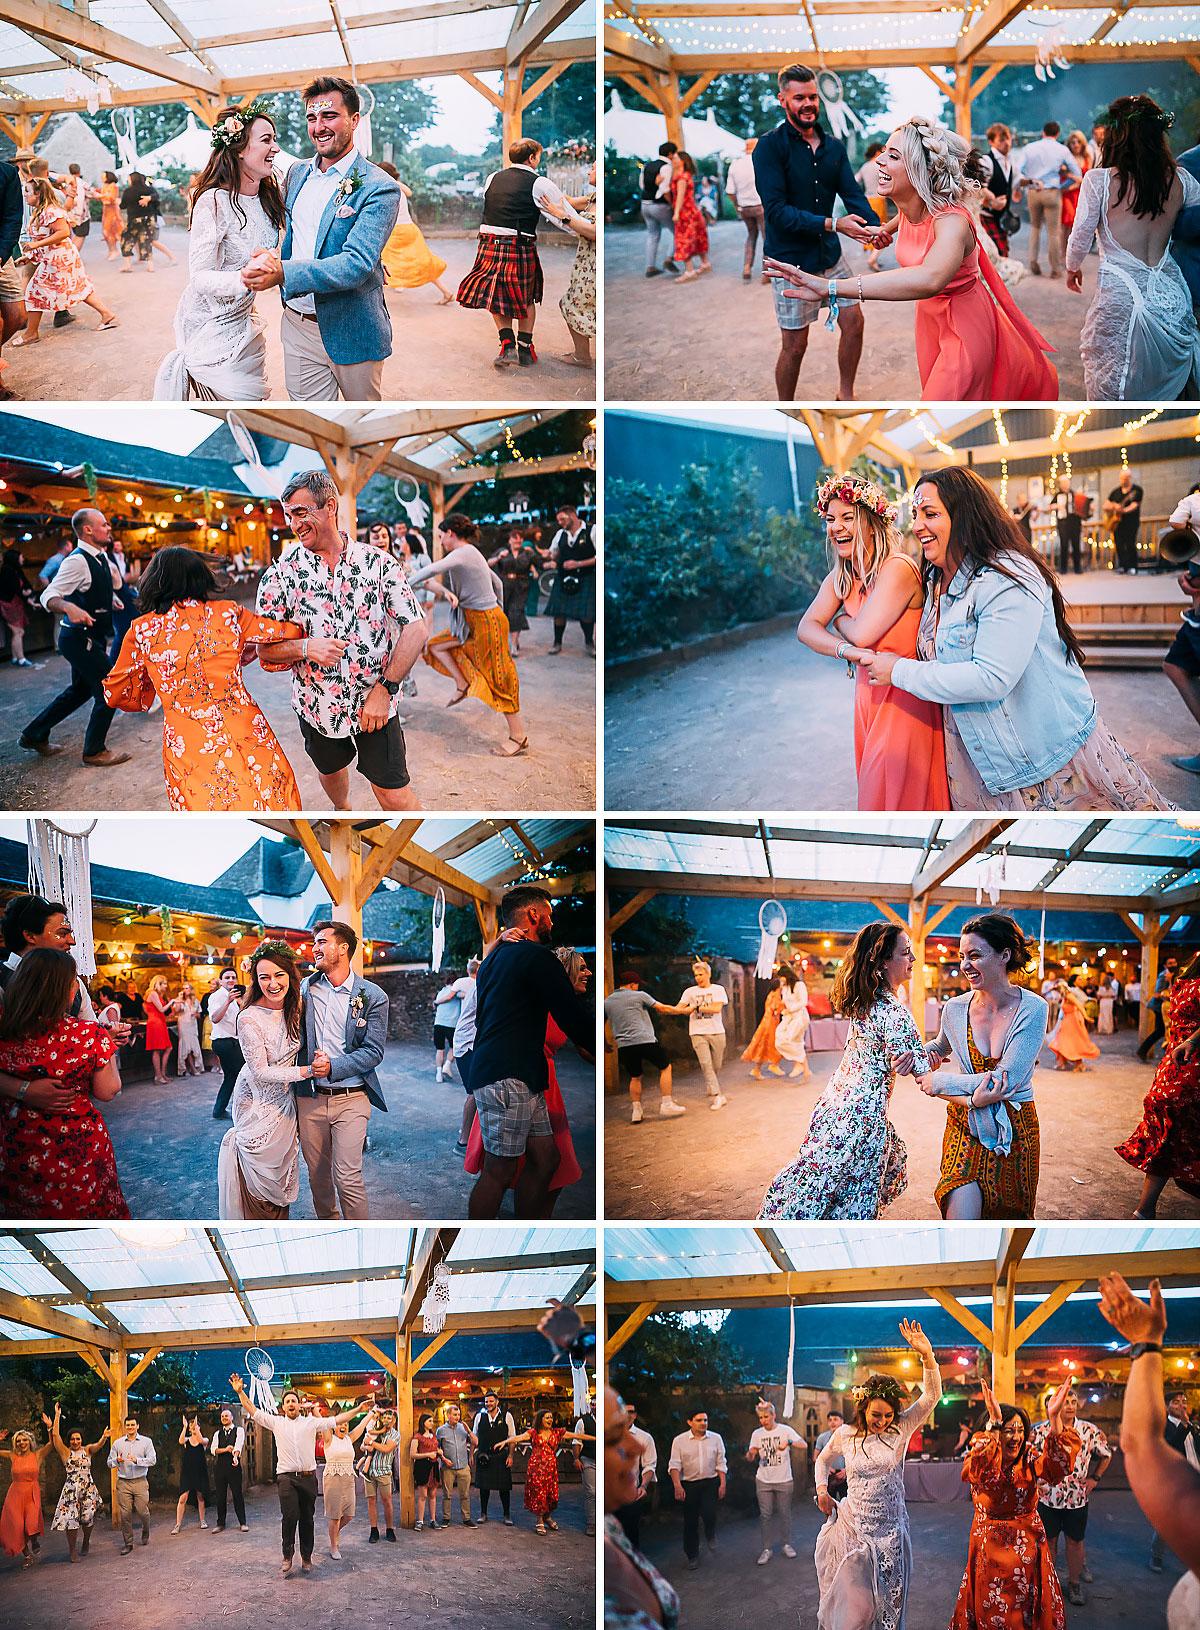 Holford Arms Wedding dancing